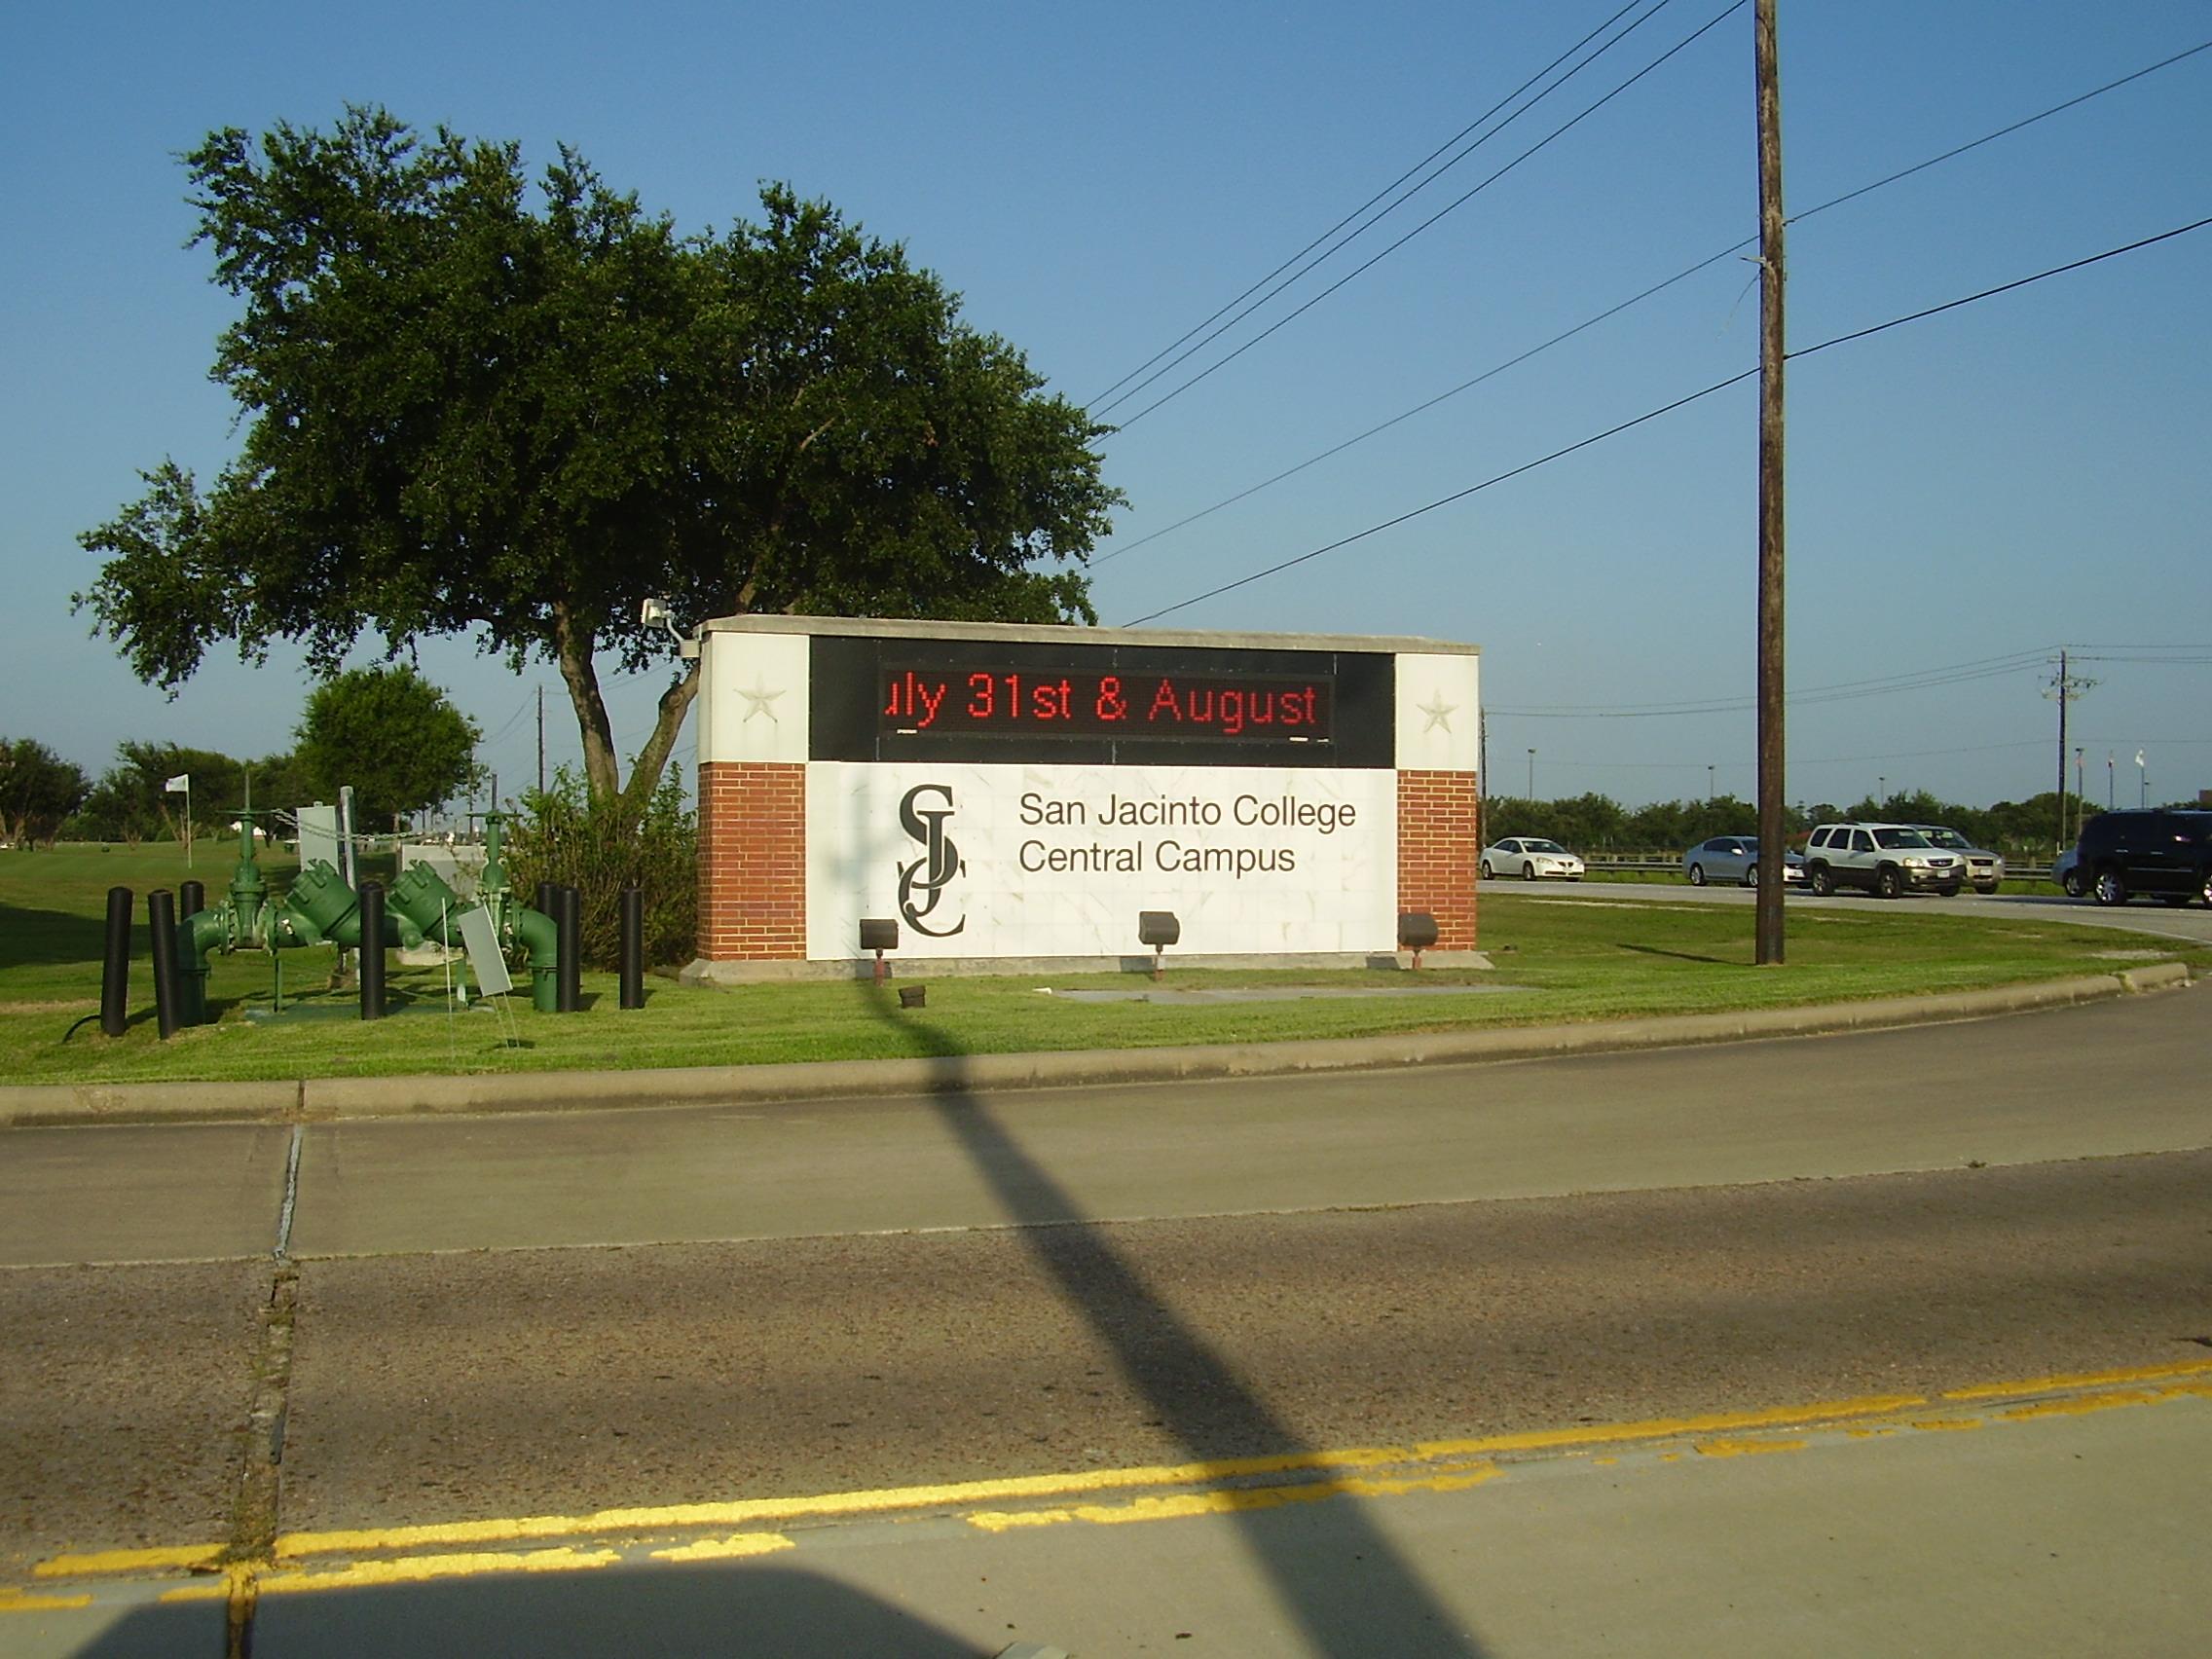 San Jacinto College Wikipedia